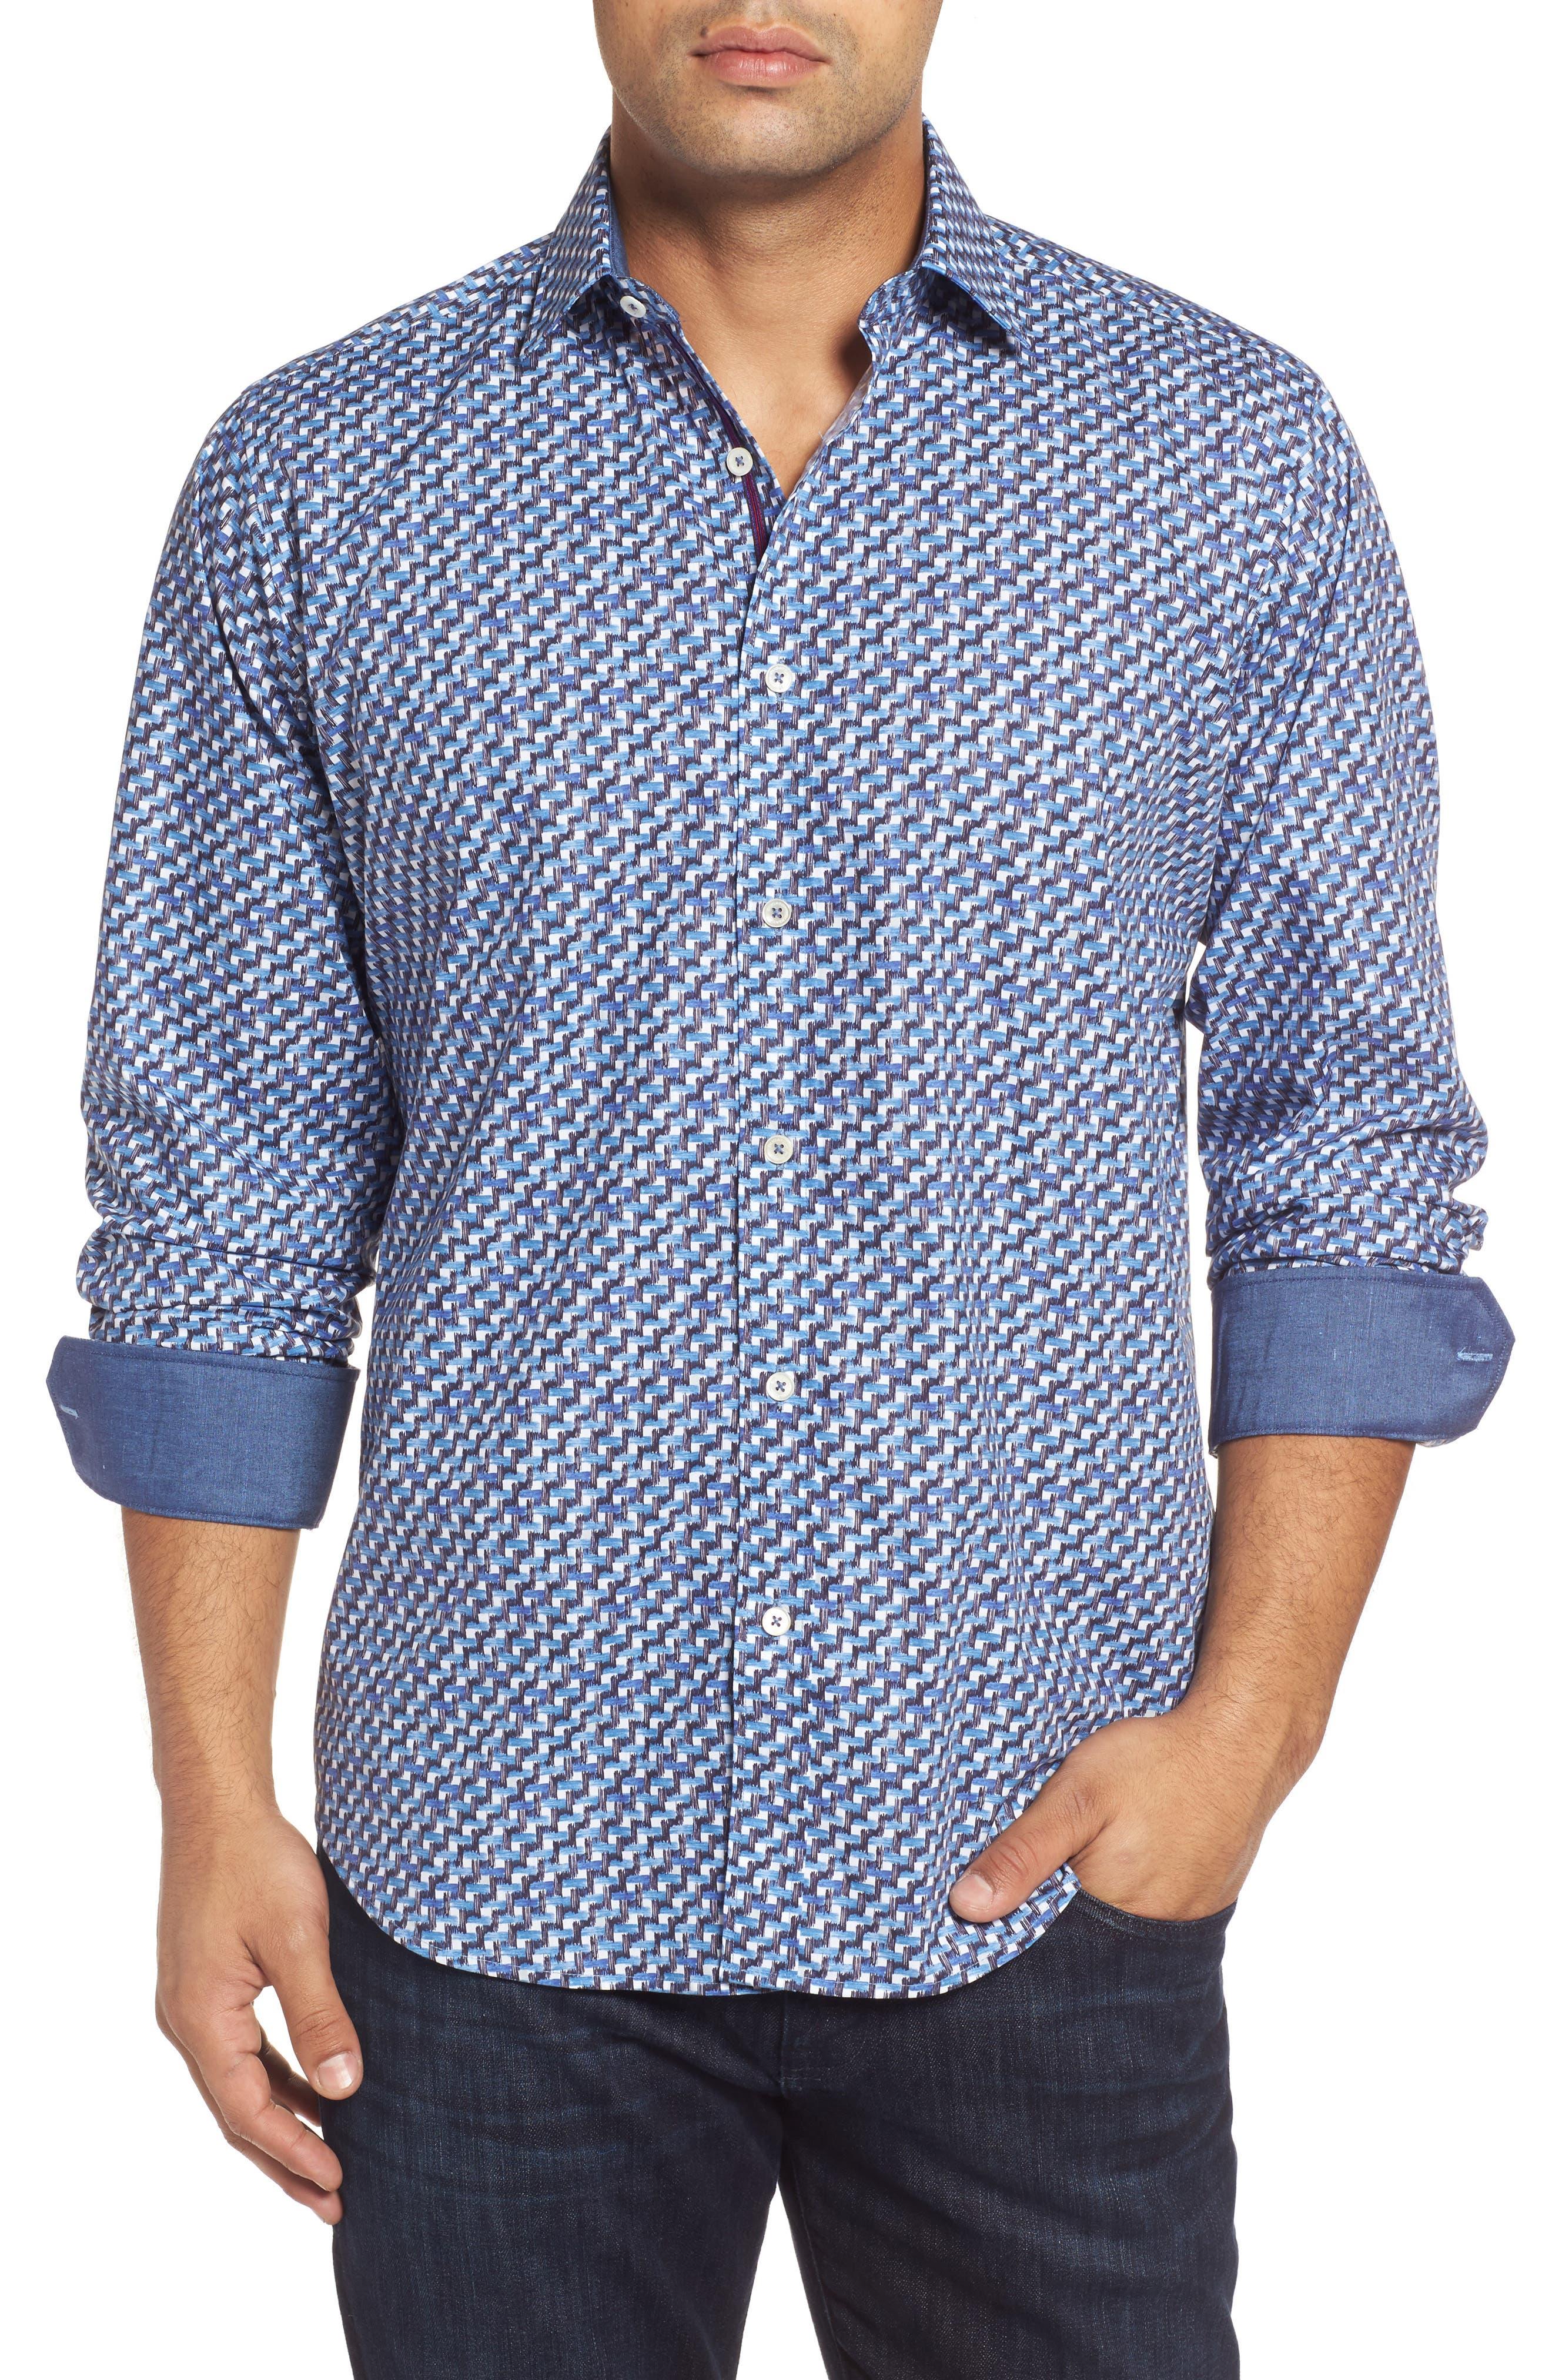 Main Image - Bugatchi Classic Fit Weave Print Sport Shirt